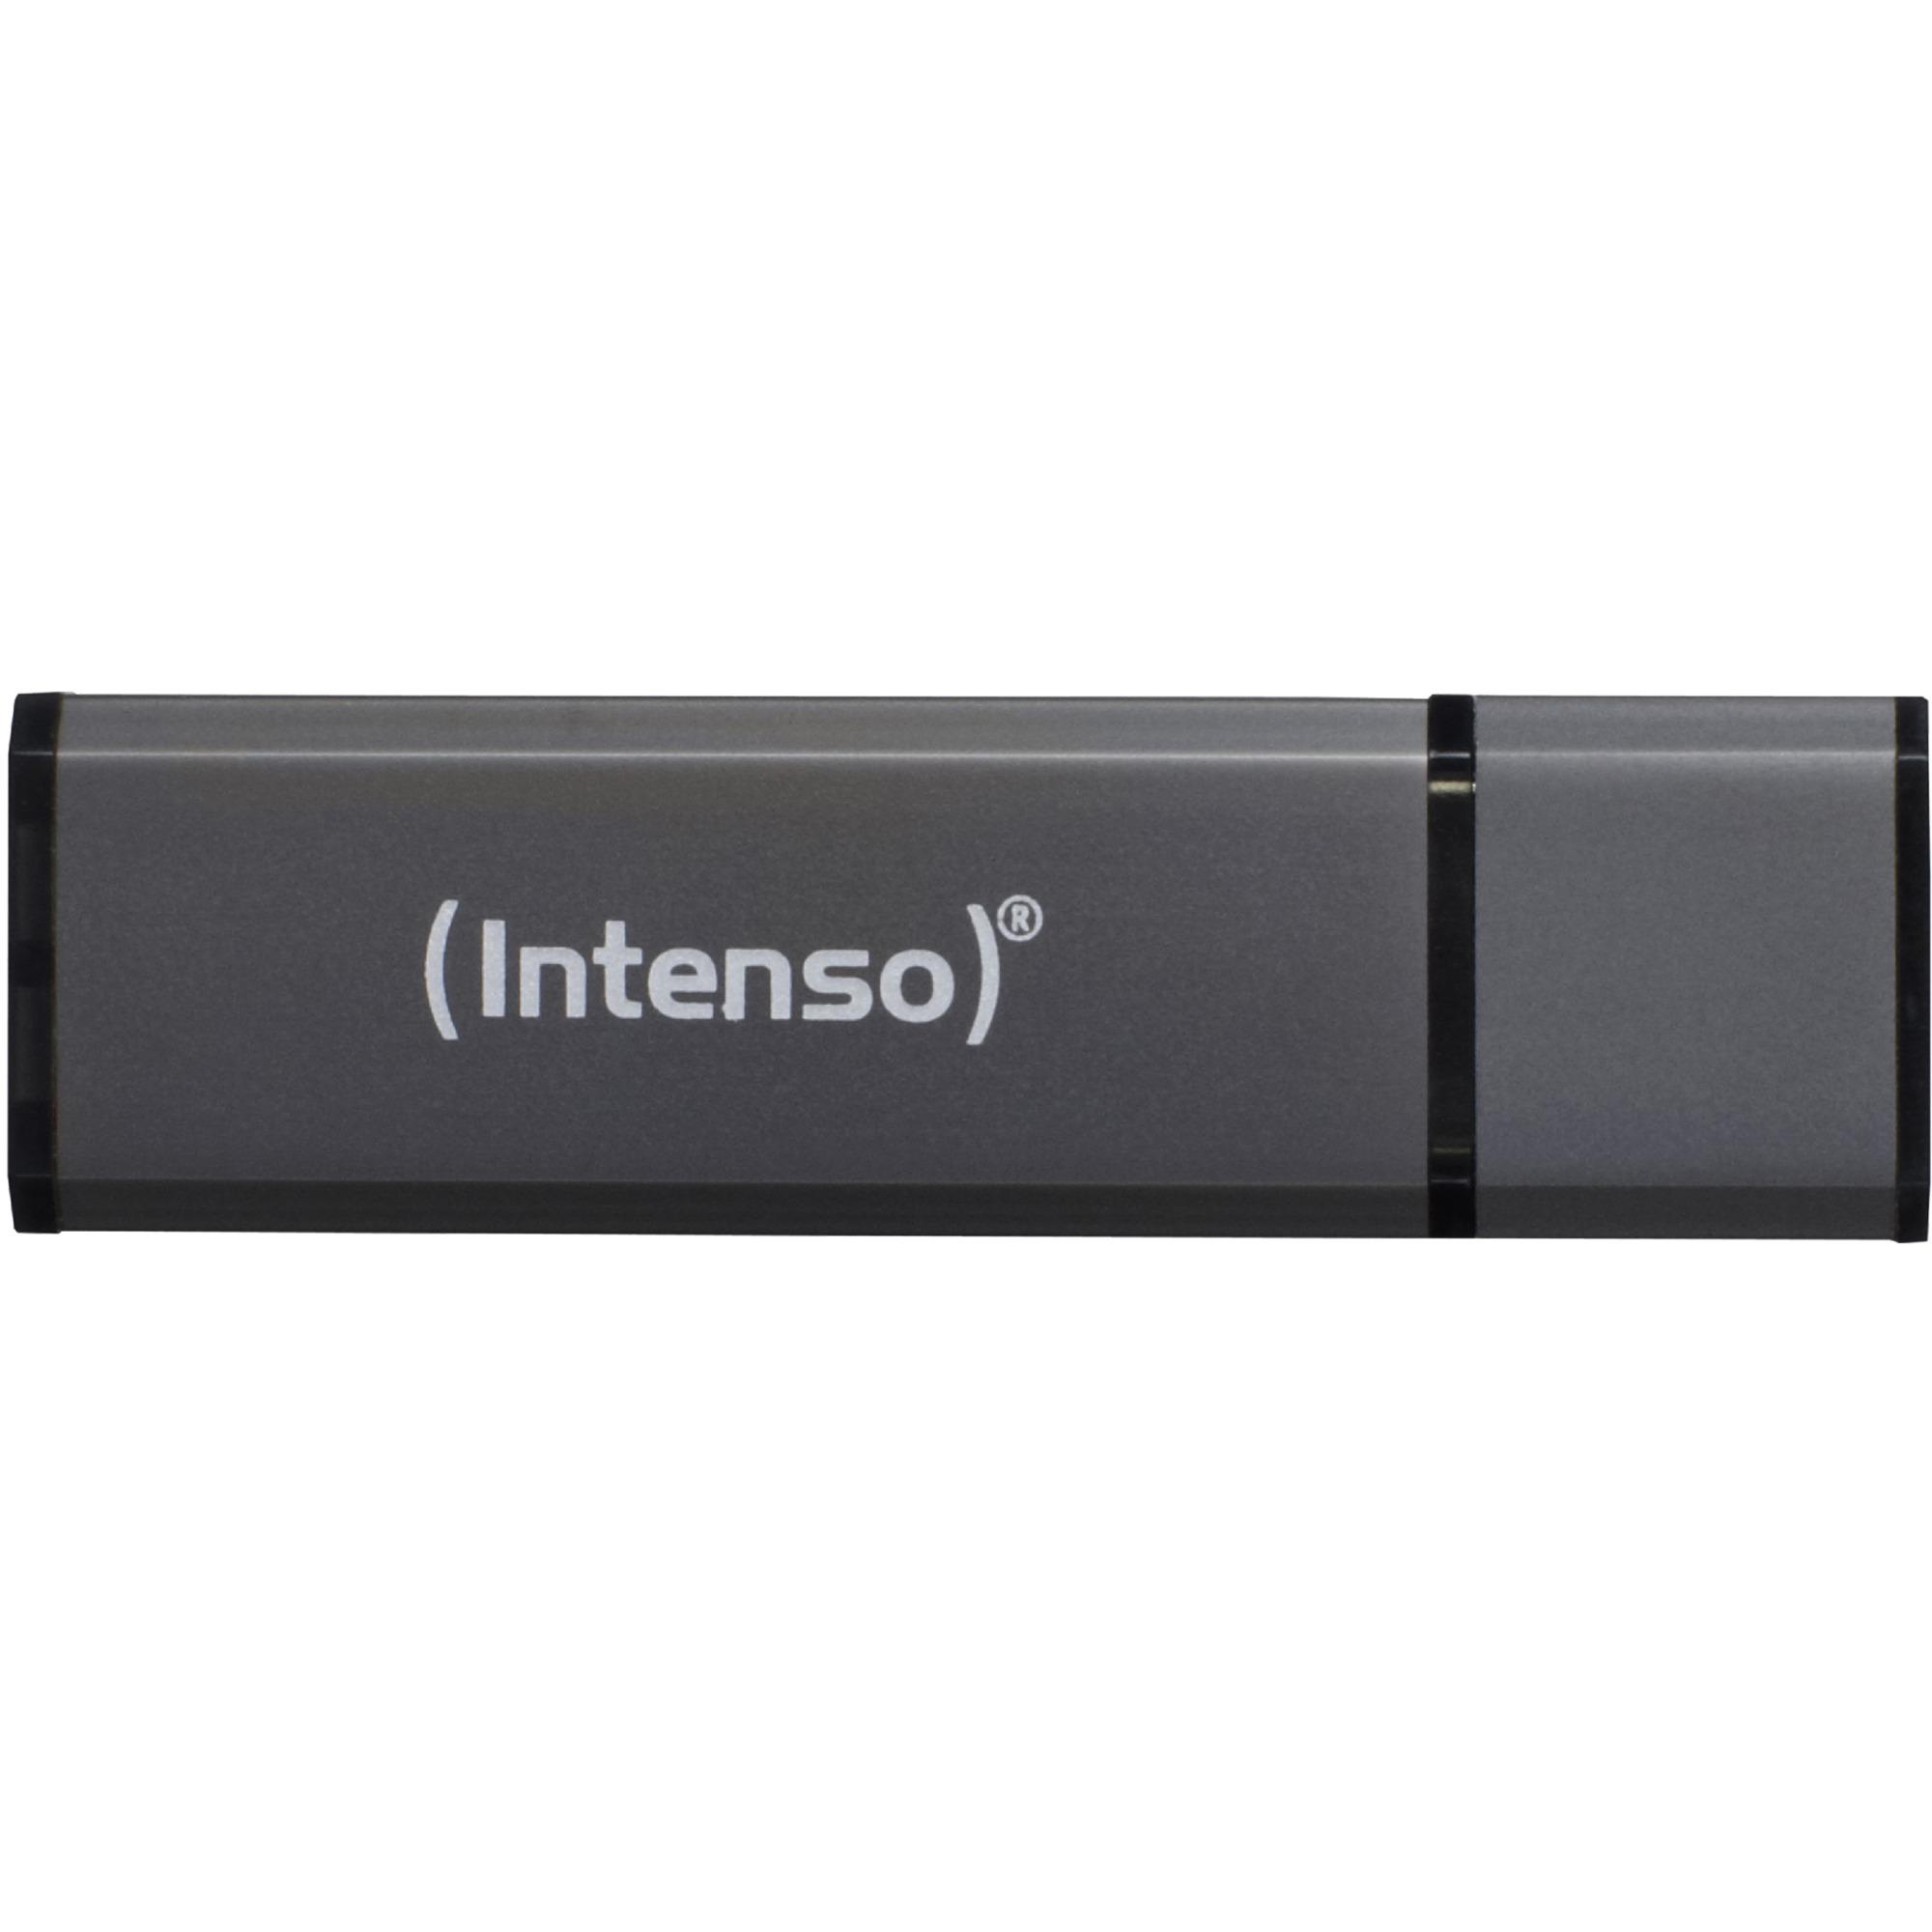 Alu Line USB 2.0, 4 GB 4Go USB 2.0 Capacity Noir lecteur USB flash, Clé USB